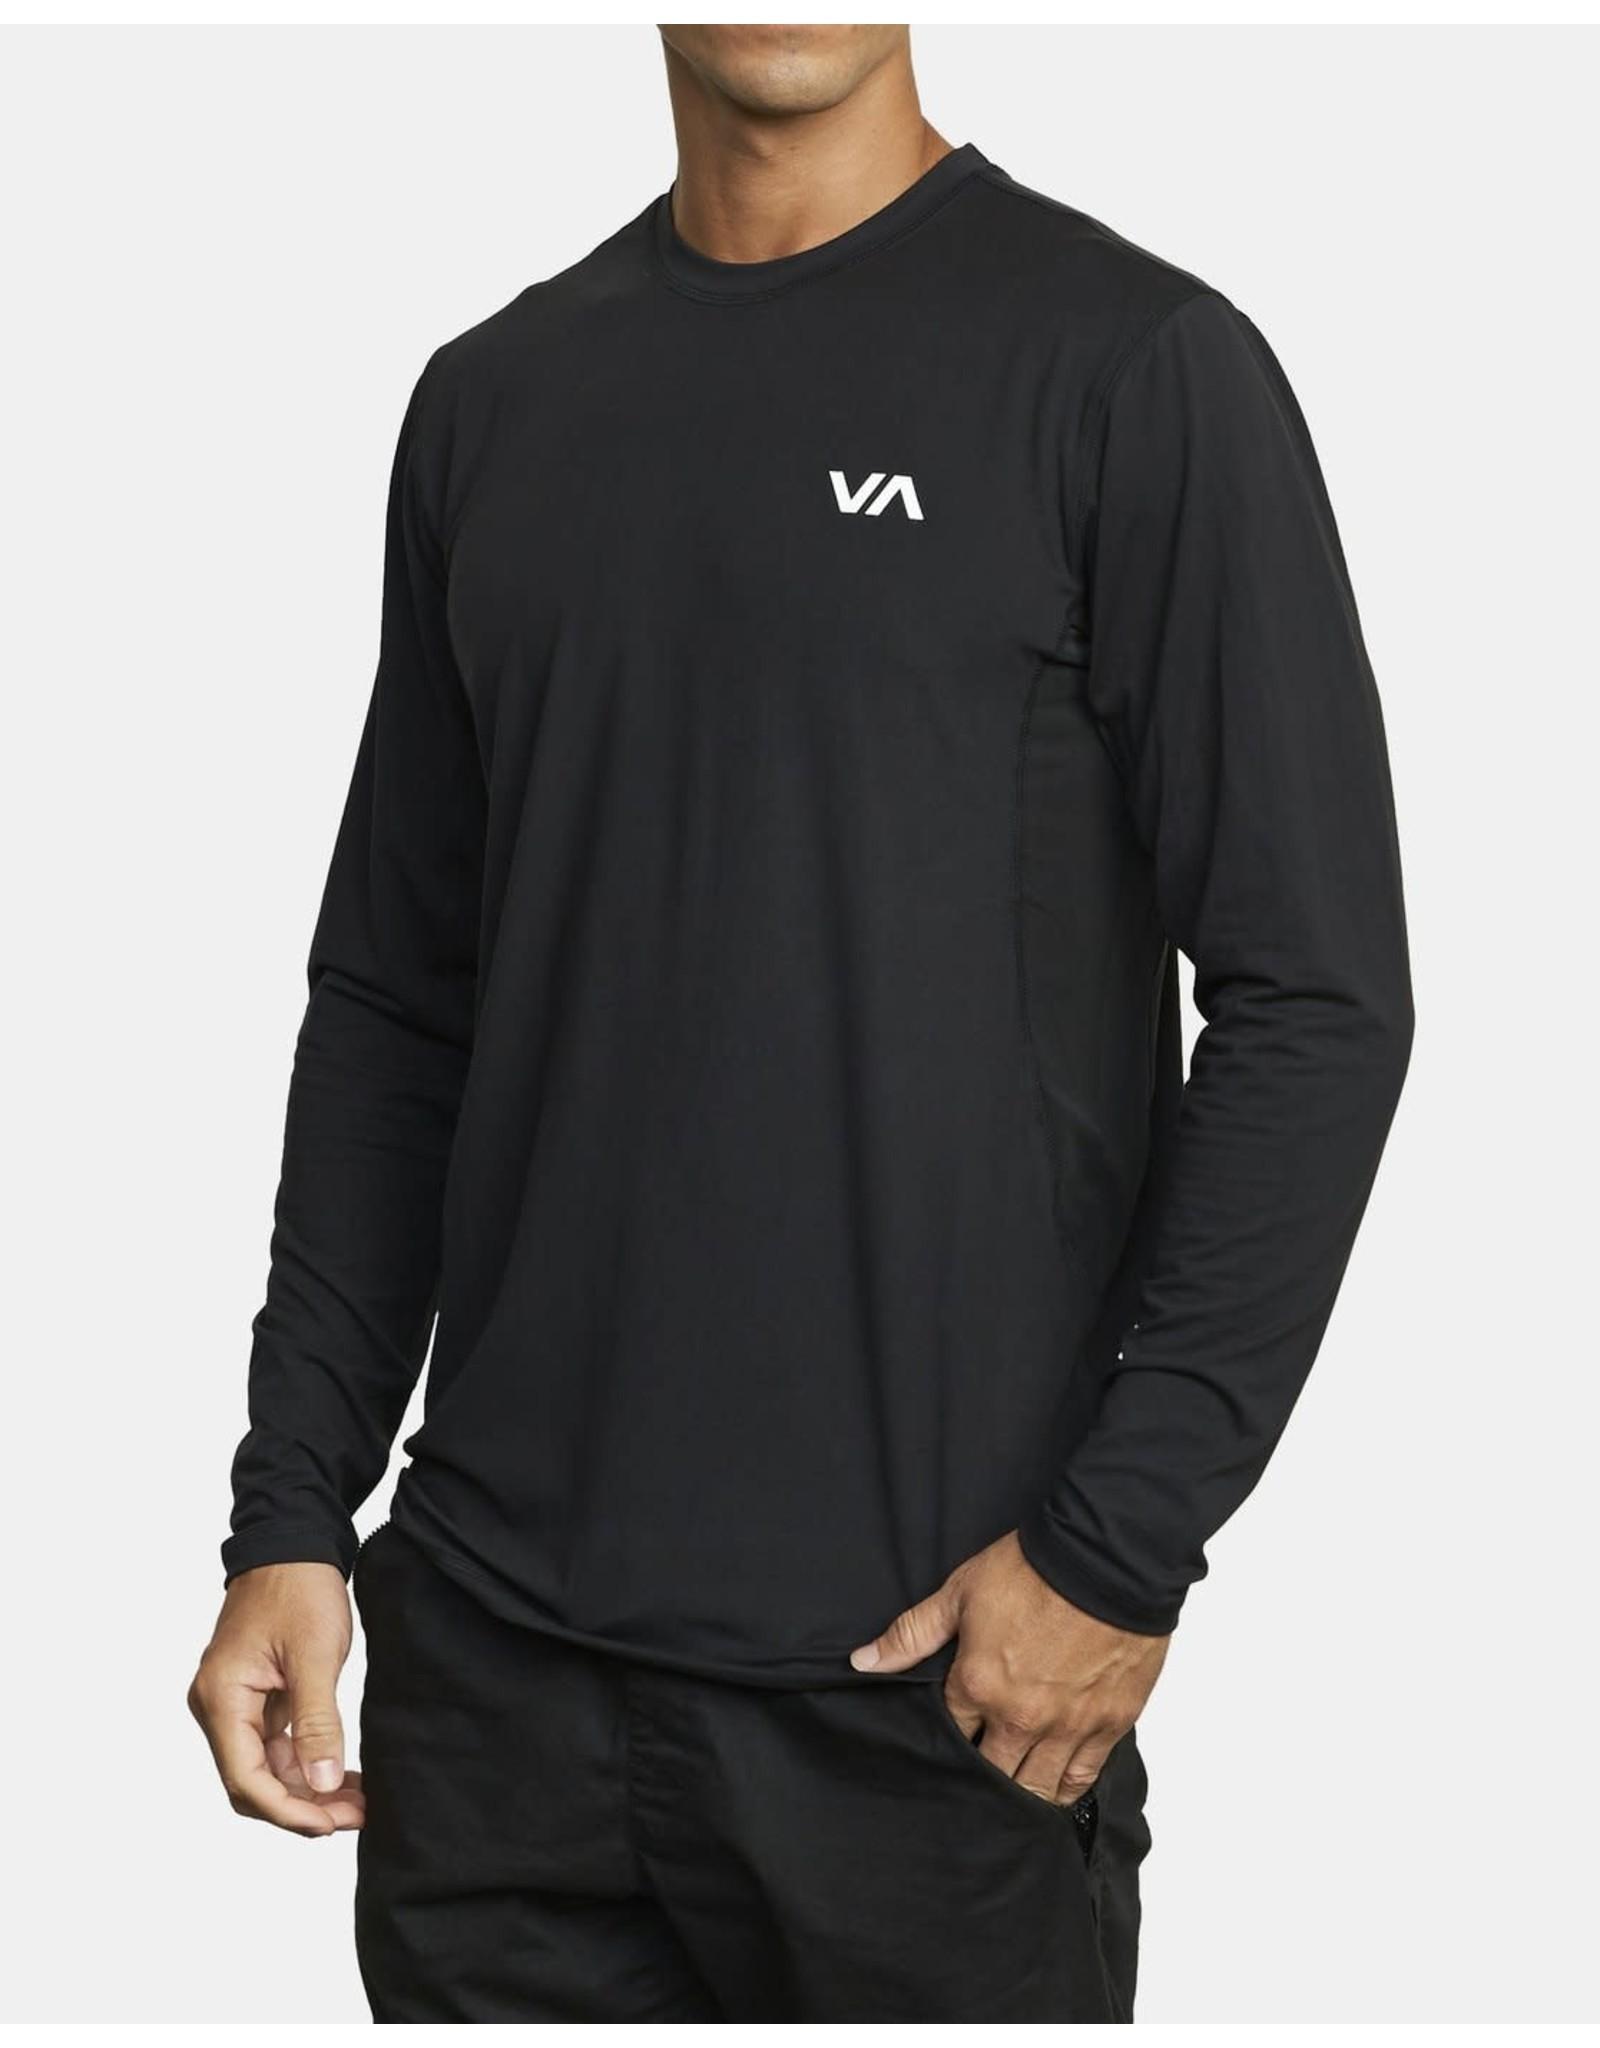 RVCA Sport Vent Long Sleeve